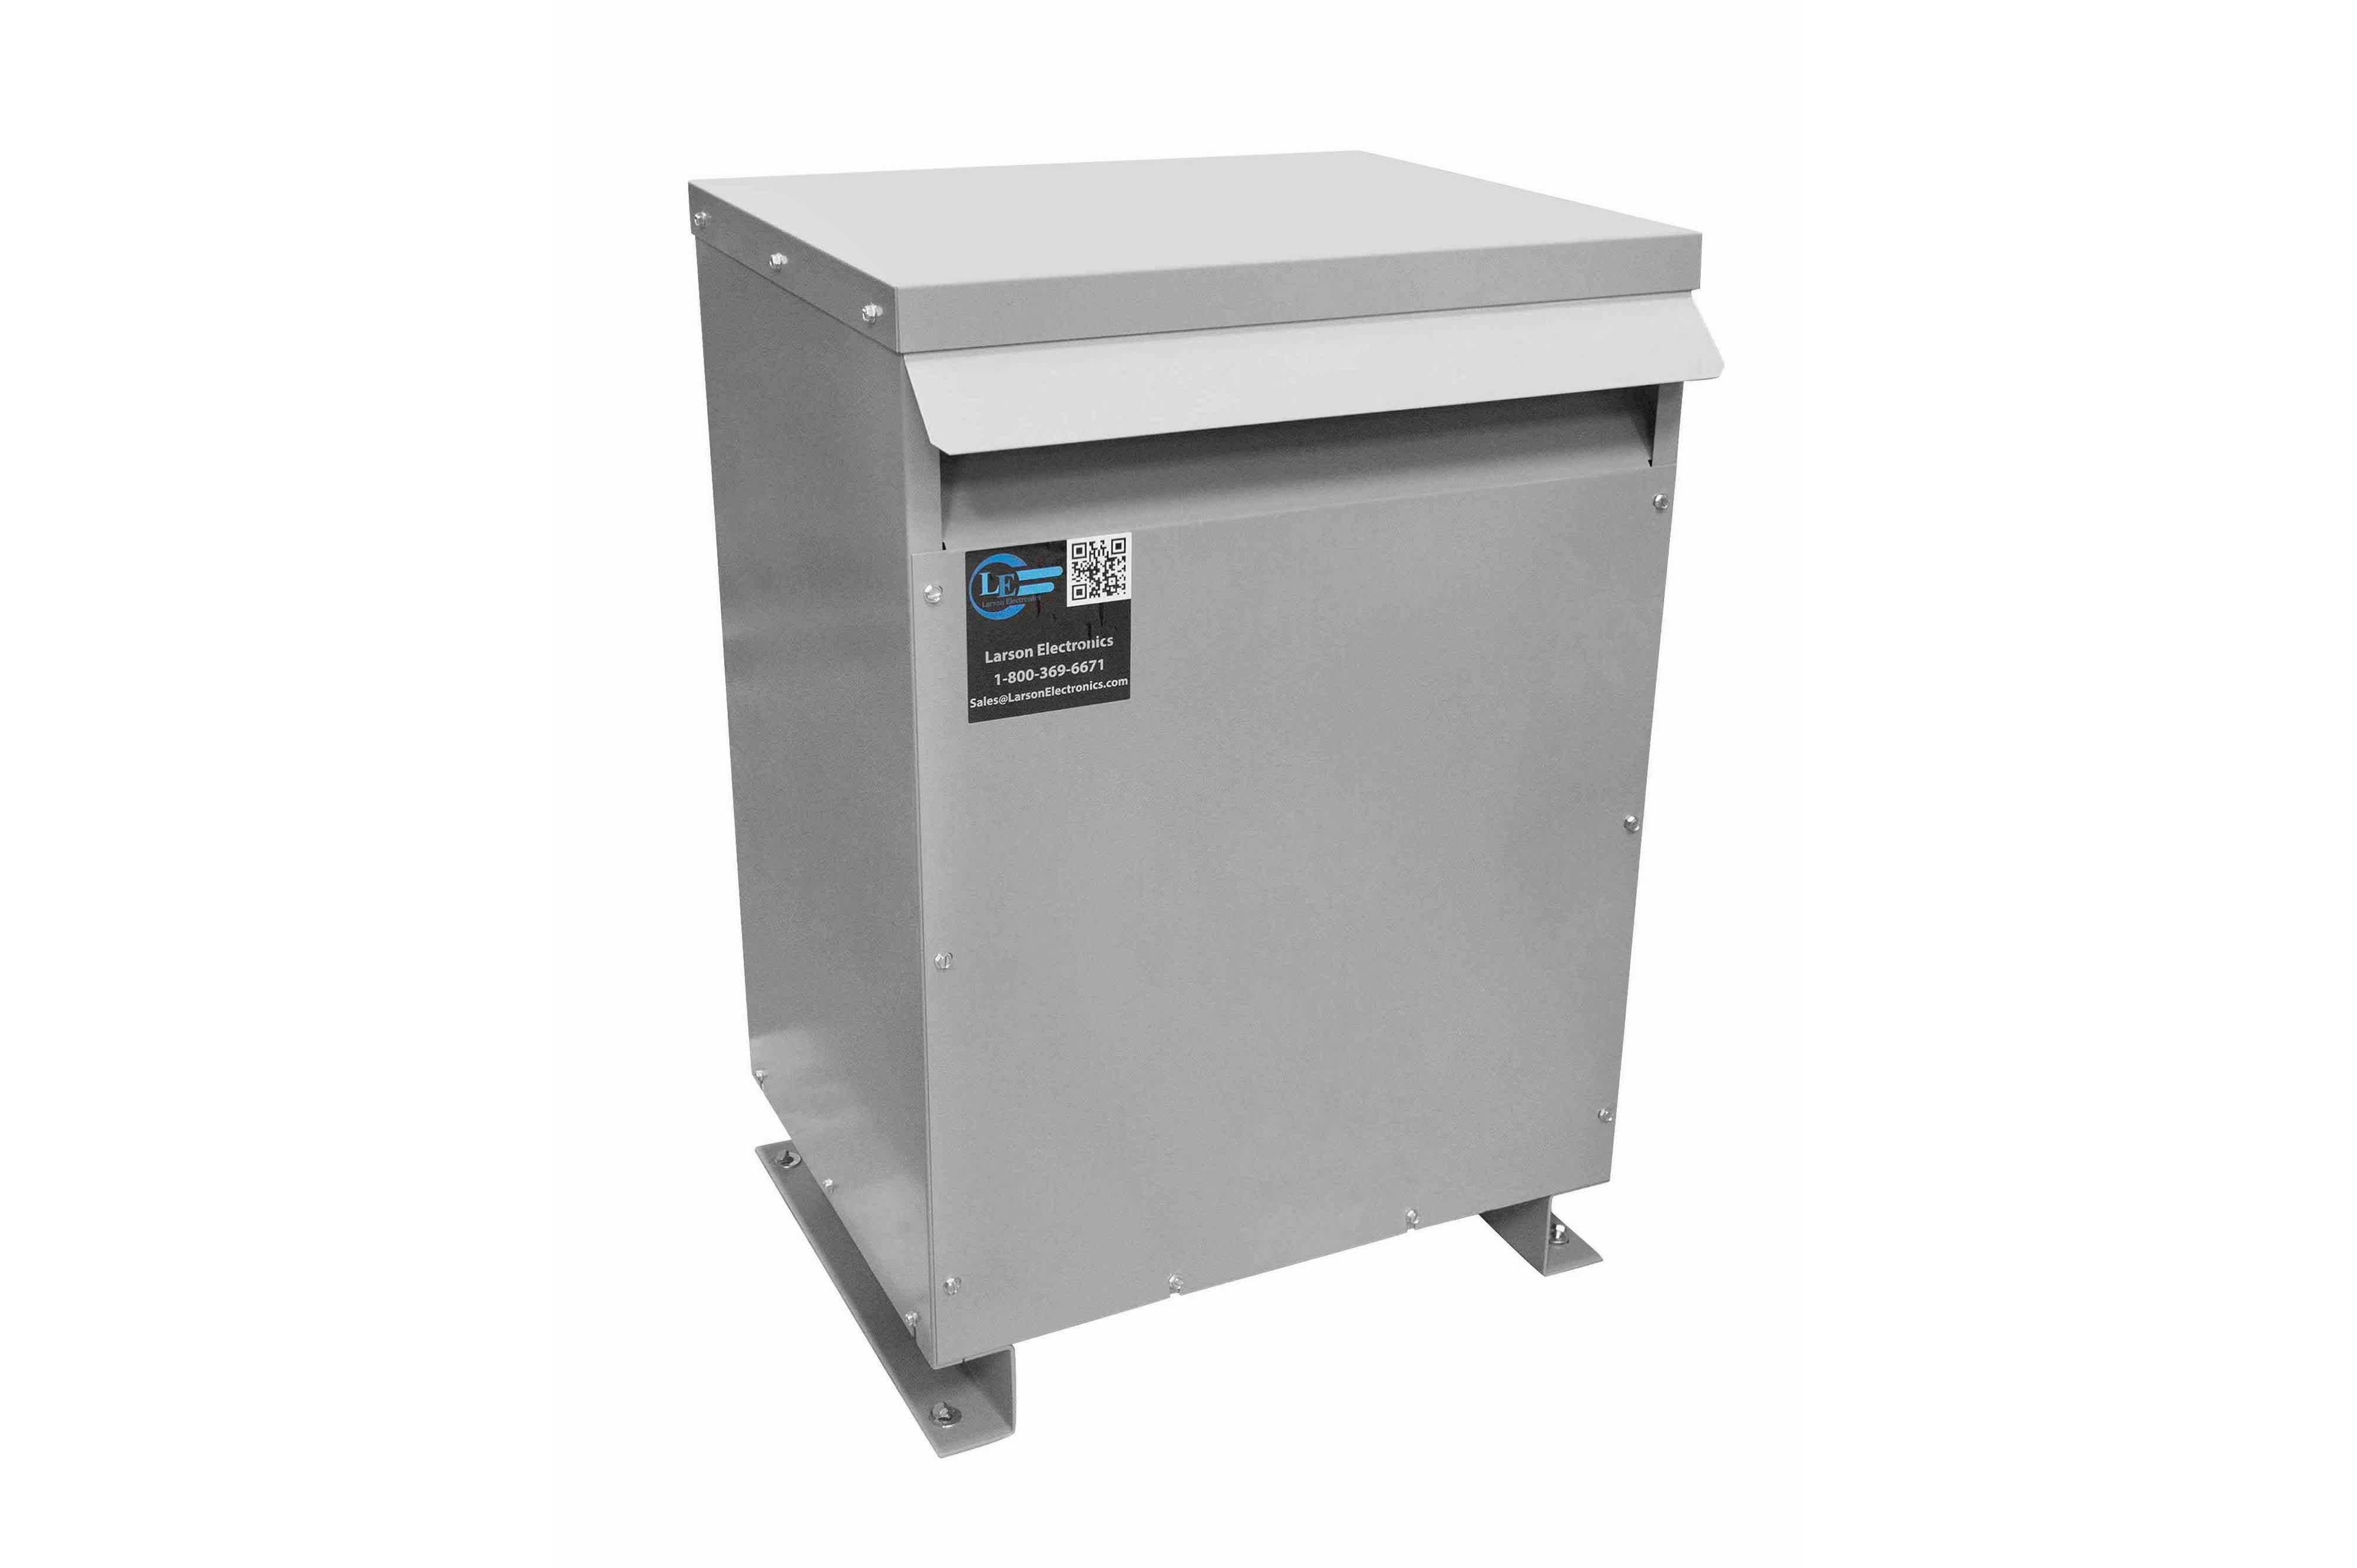 75 kVA 3PH DOE Transformer, 480V Delta Primary, 600Y/347 Wye-N Secondary, N3R, Ventilated, 60 Hz